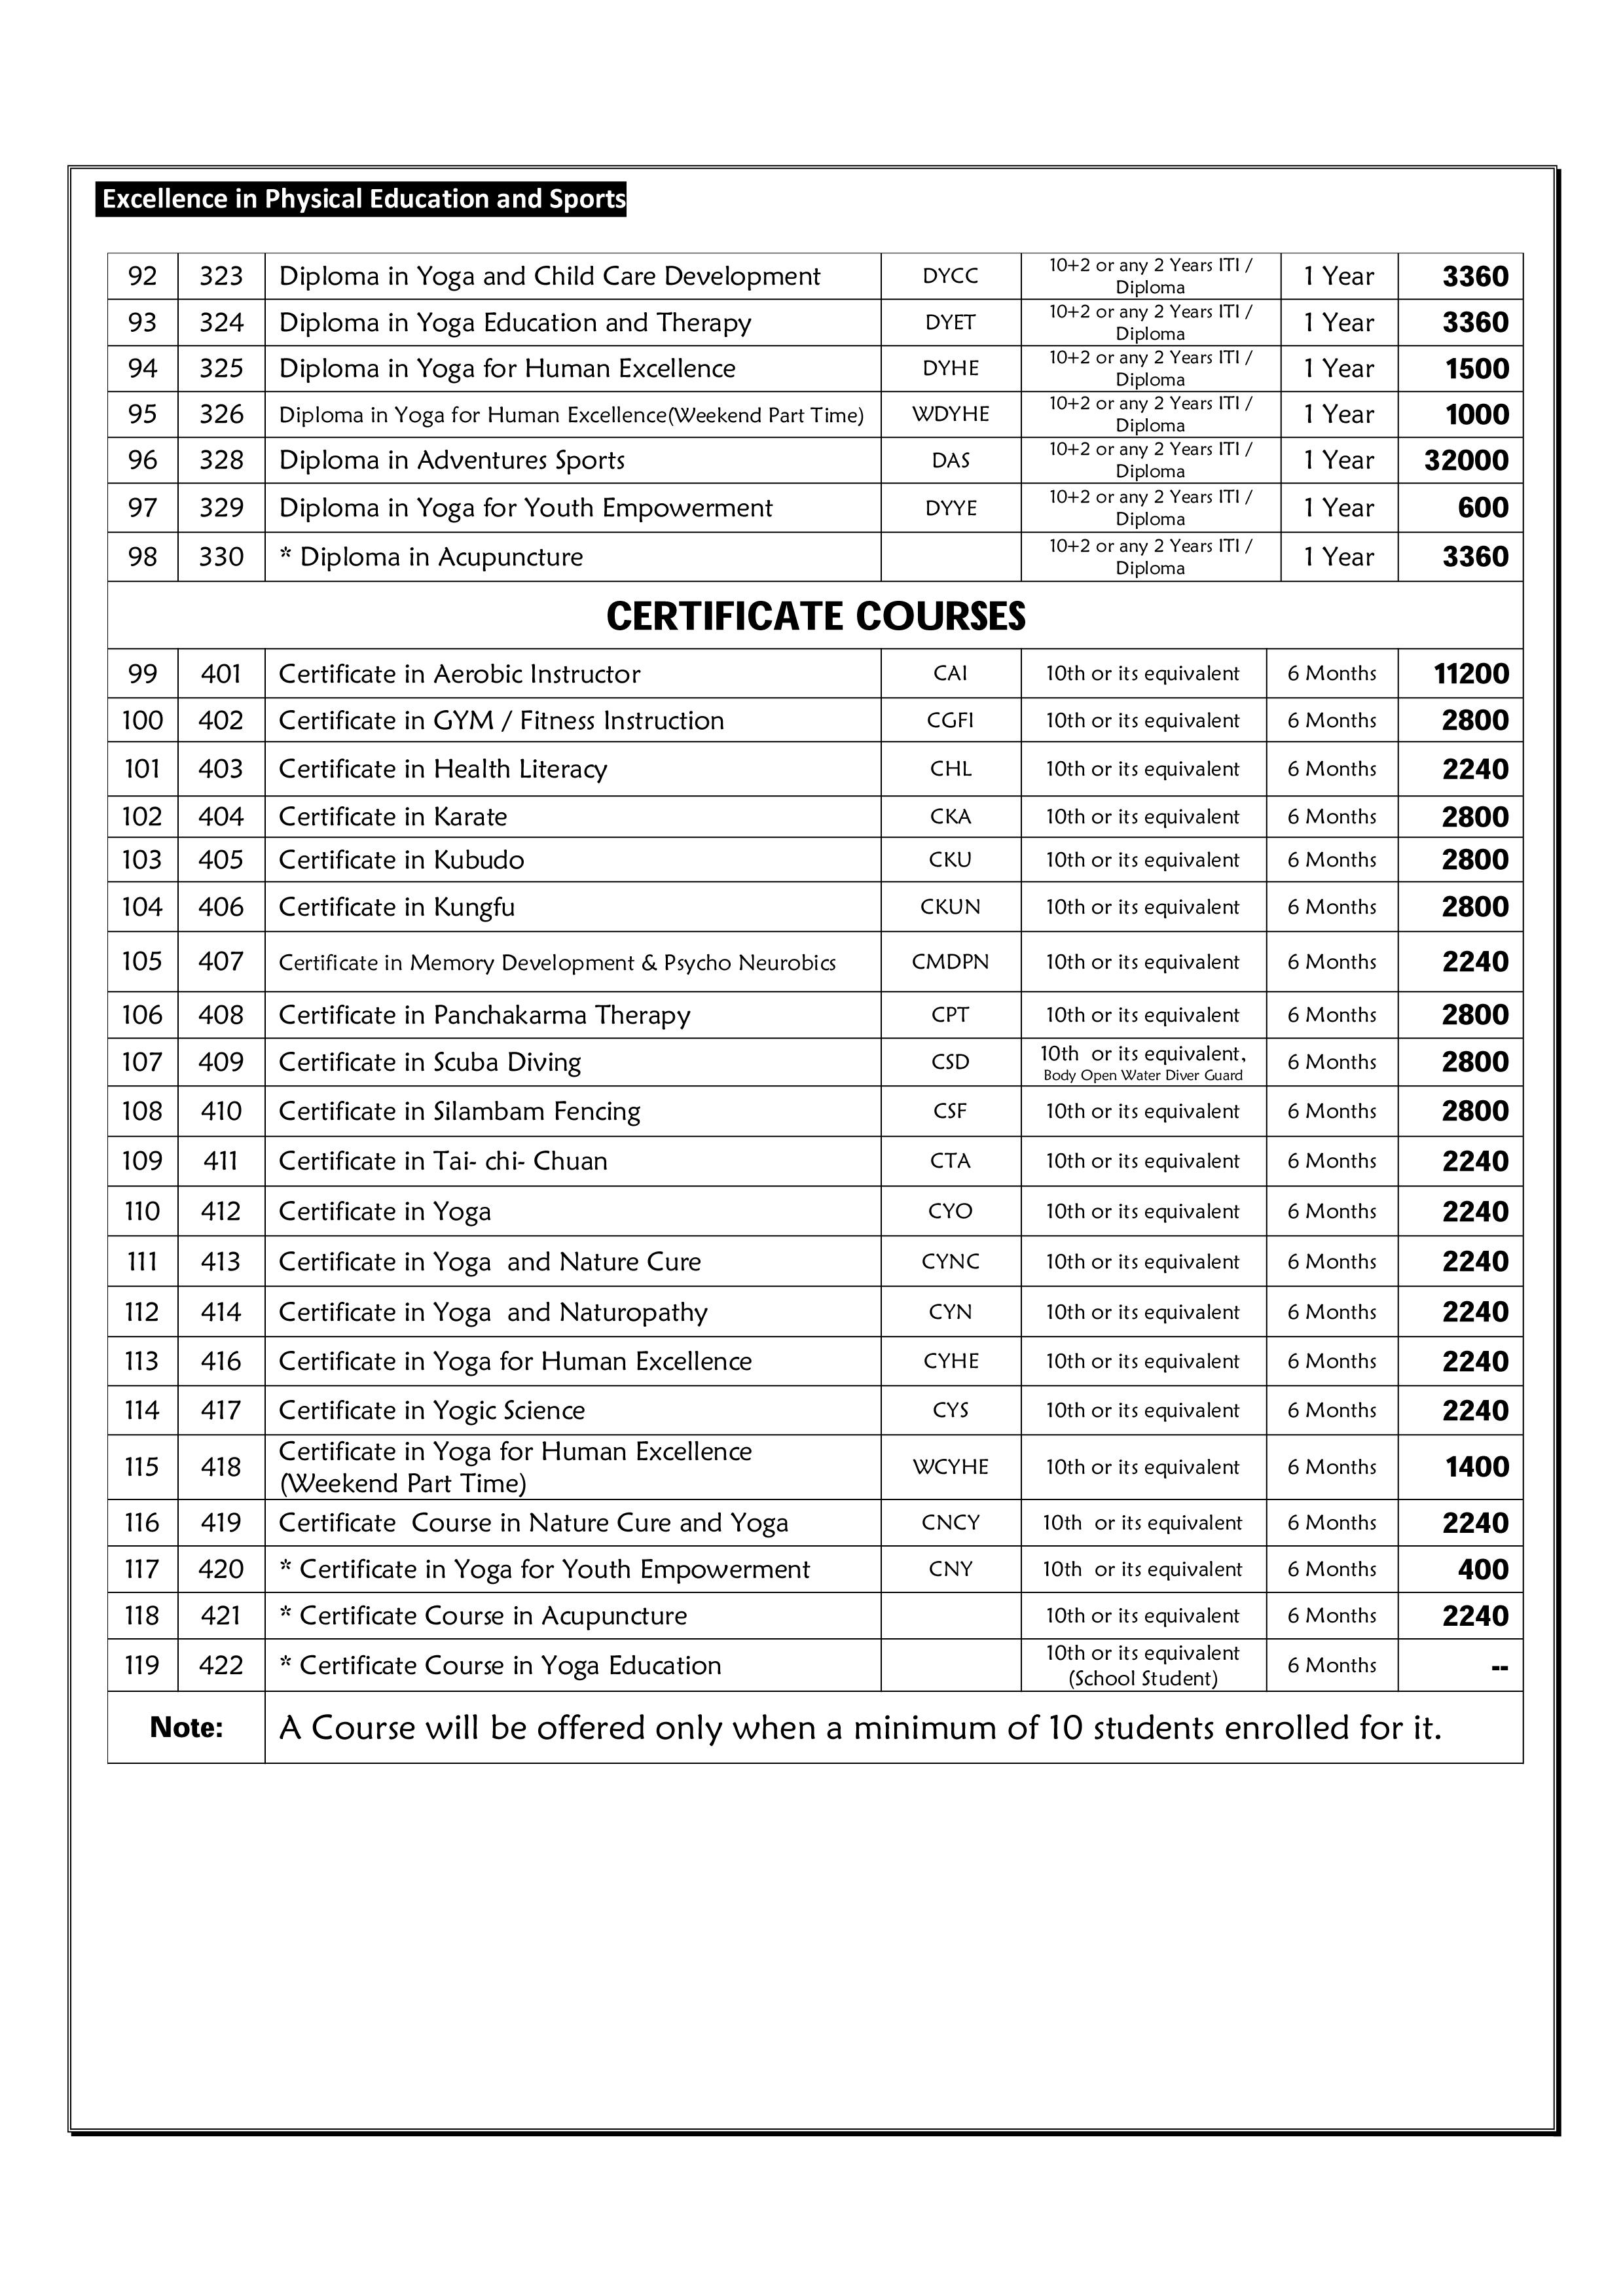 TNPSU DDE List of Courses 2016-17 4